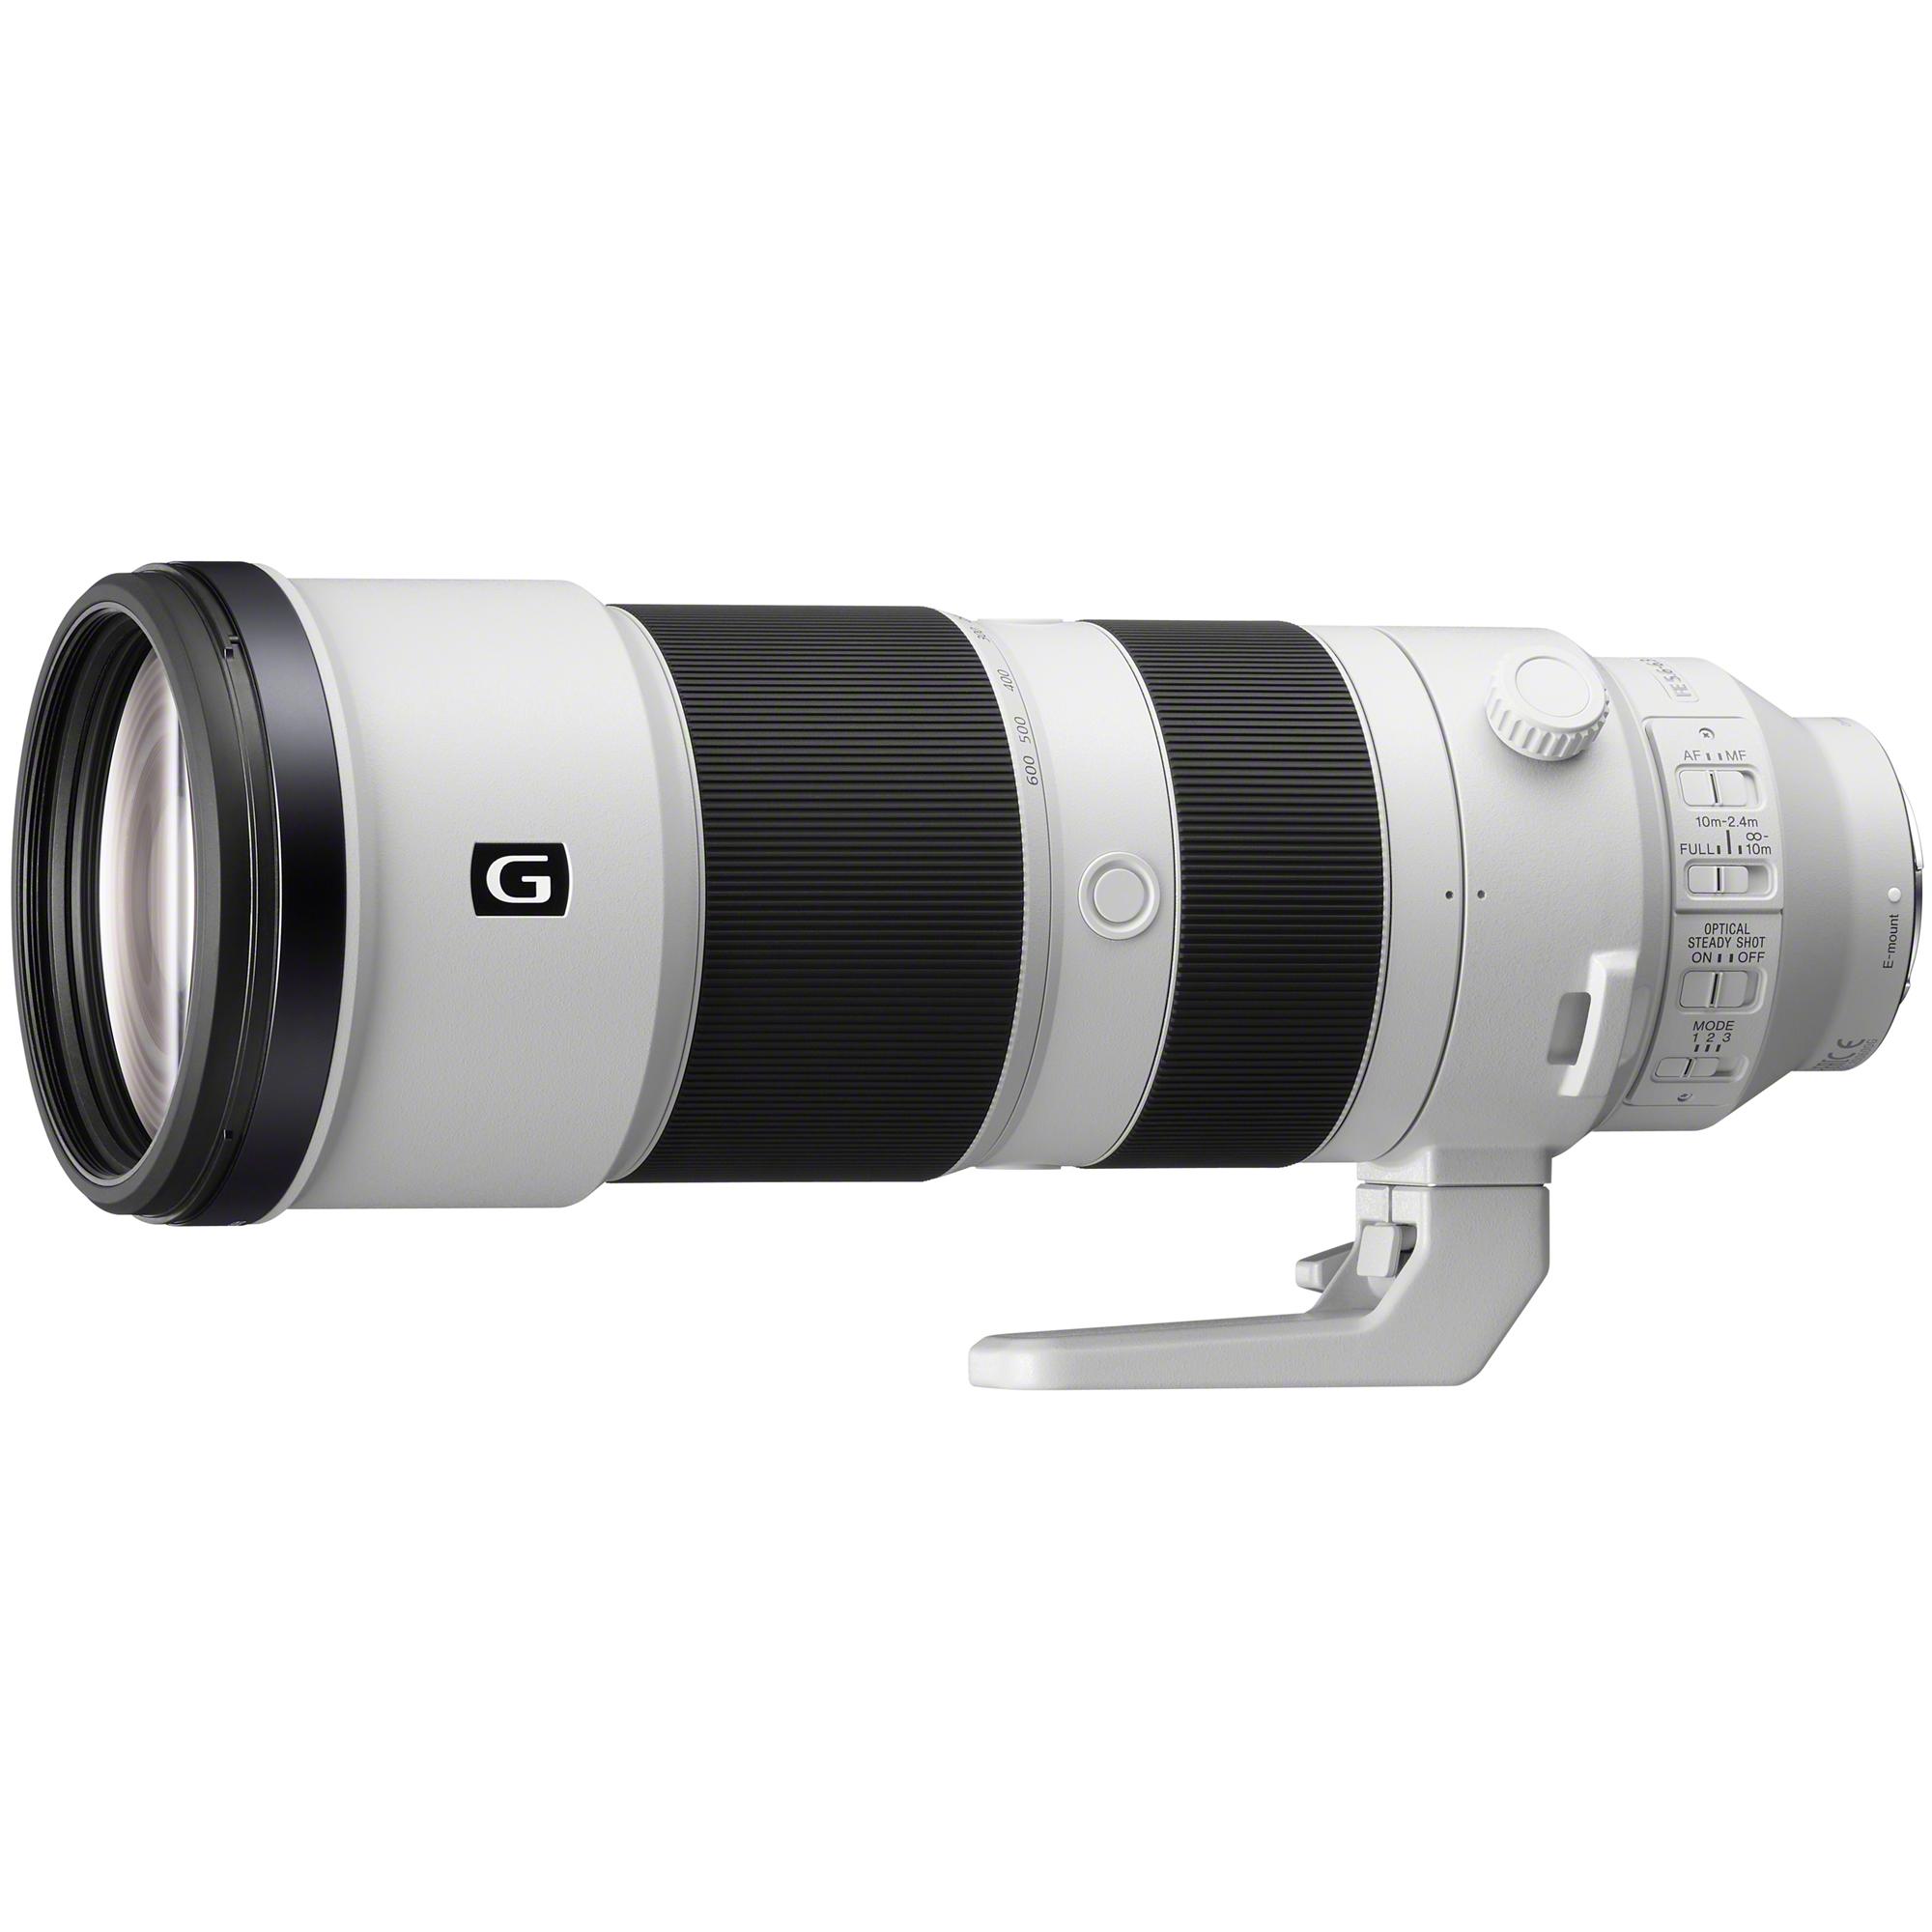 Sony Lenses: FE 200-600mm F5.6-6.3 G OSS $1498, FE 100-400mm f/4.5-5.6 GM OSS $2149, FE 20mm F1.8 G $663 & More + free s/h